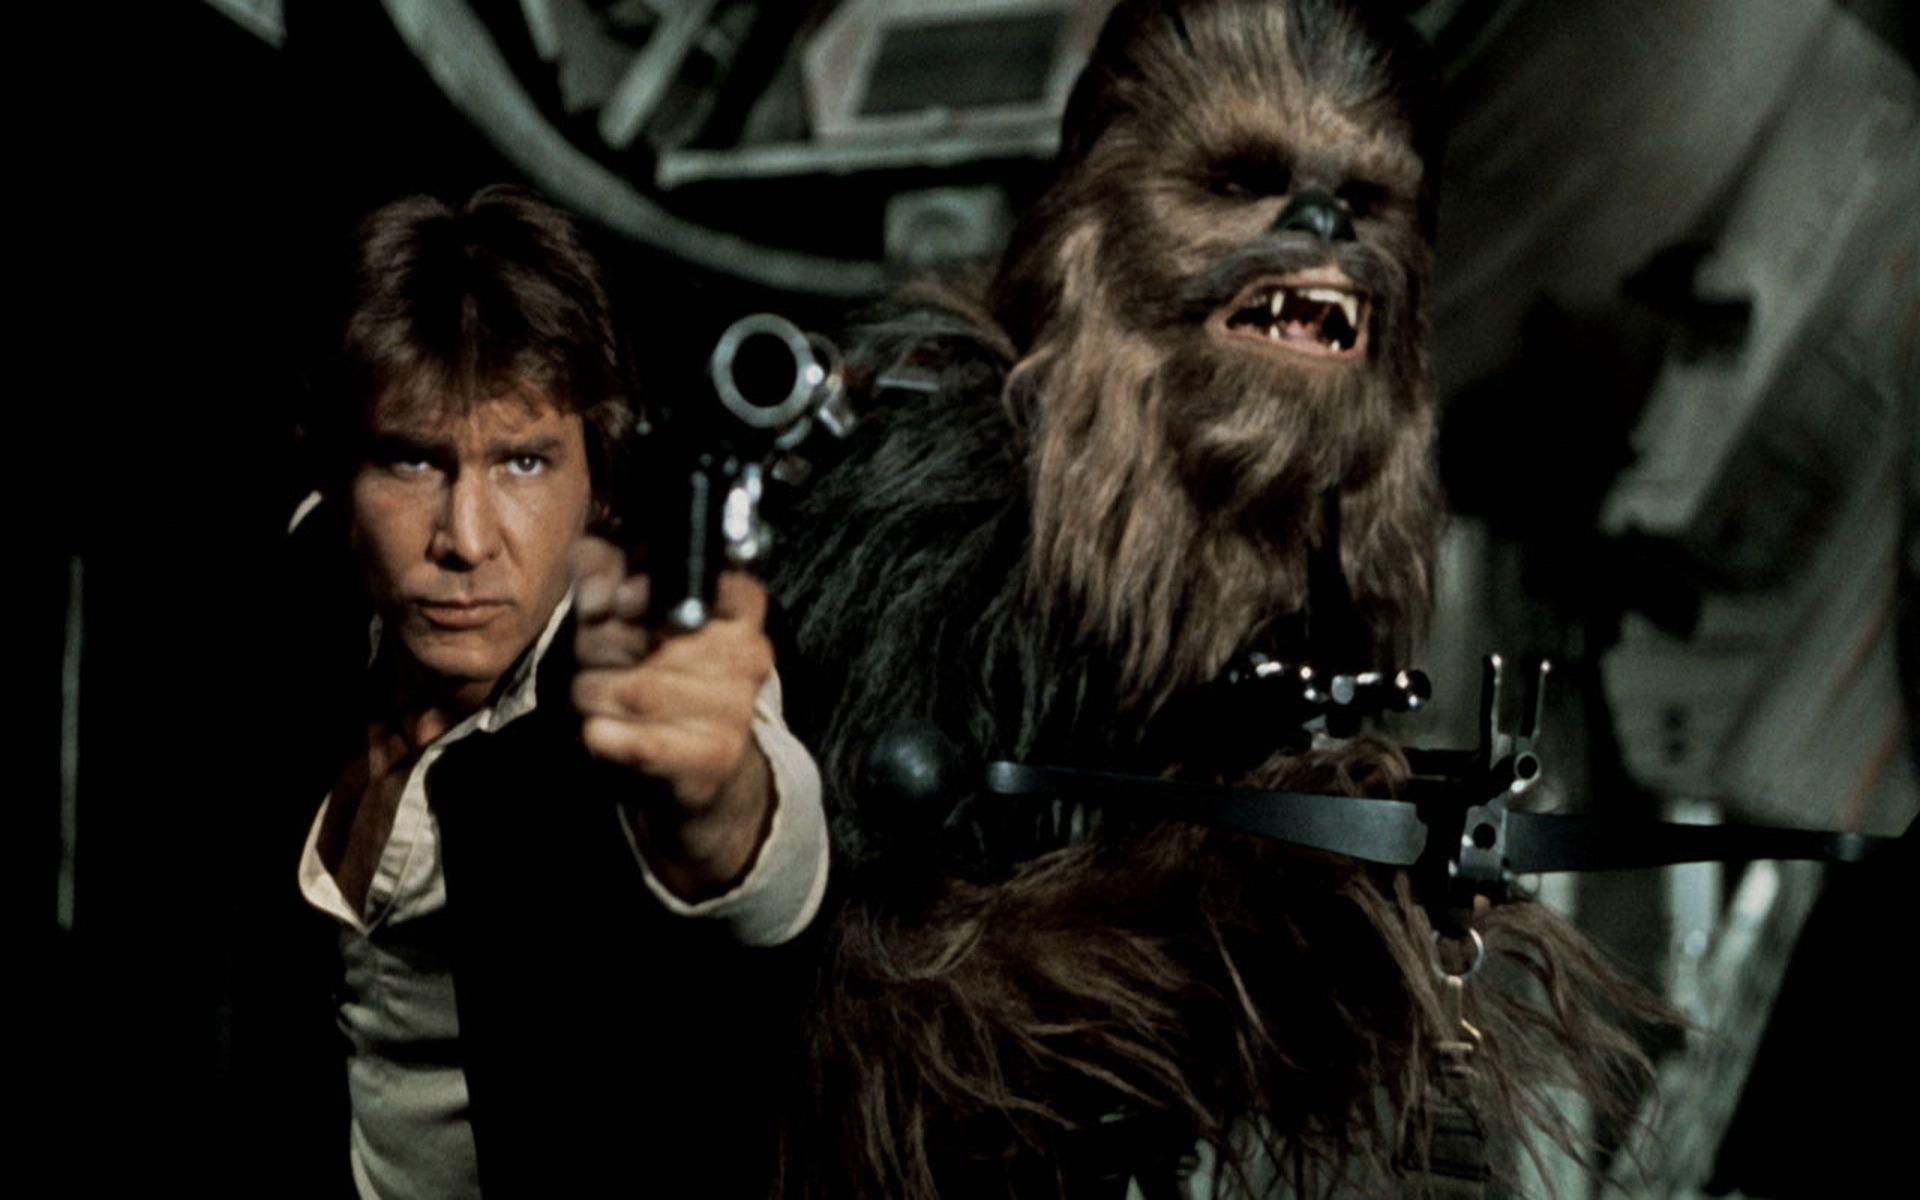 Han Solo Chewbacca Star Wars Episode Iv Star Wars Episode Iv Han Solo And Chewbacca Star Wars Chewbacca